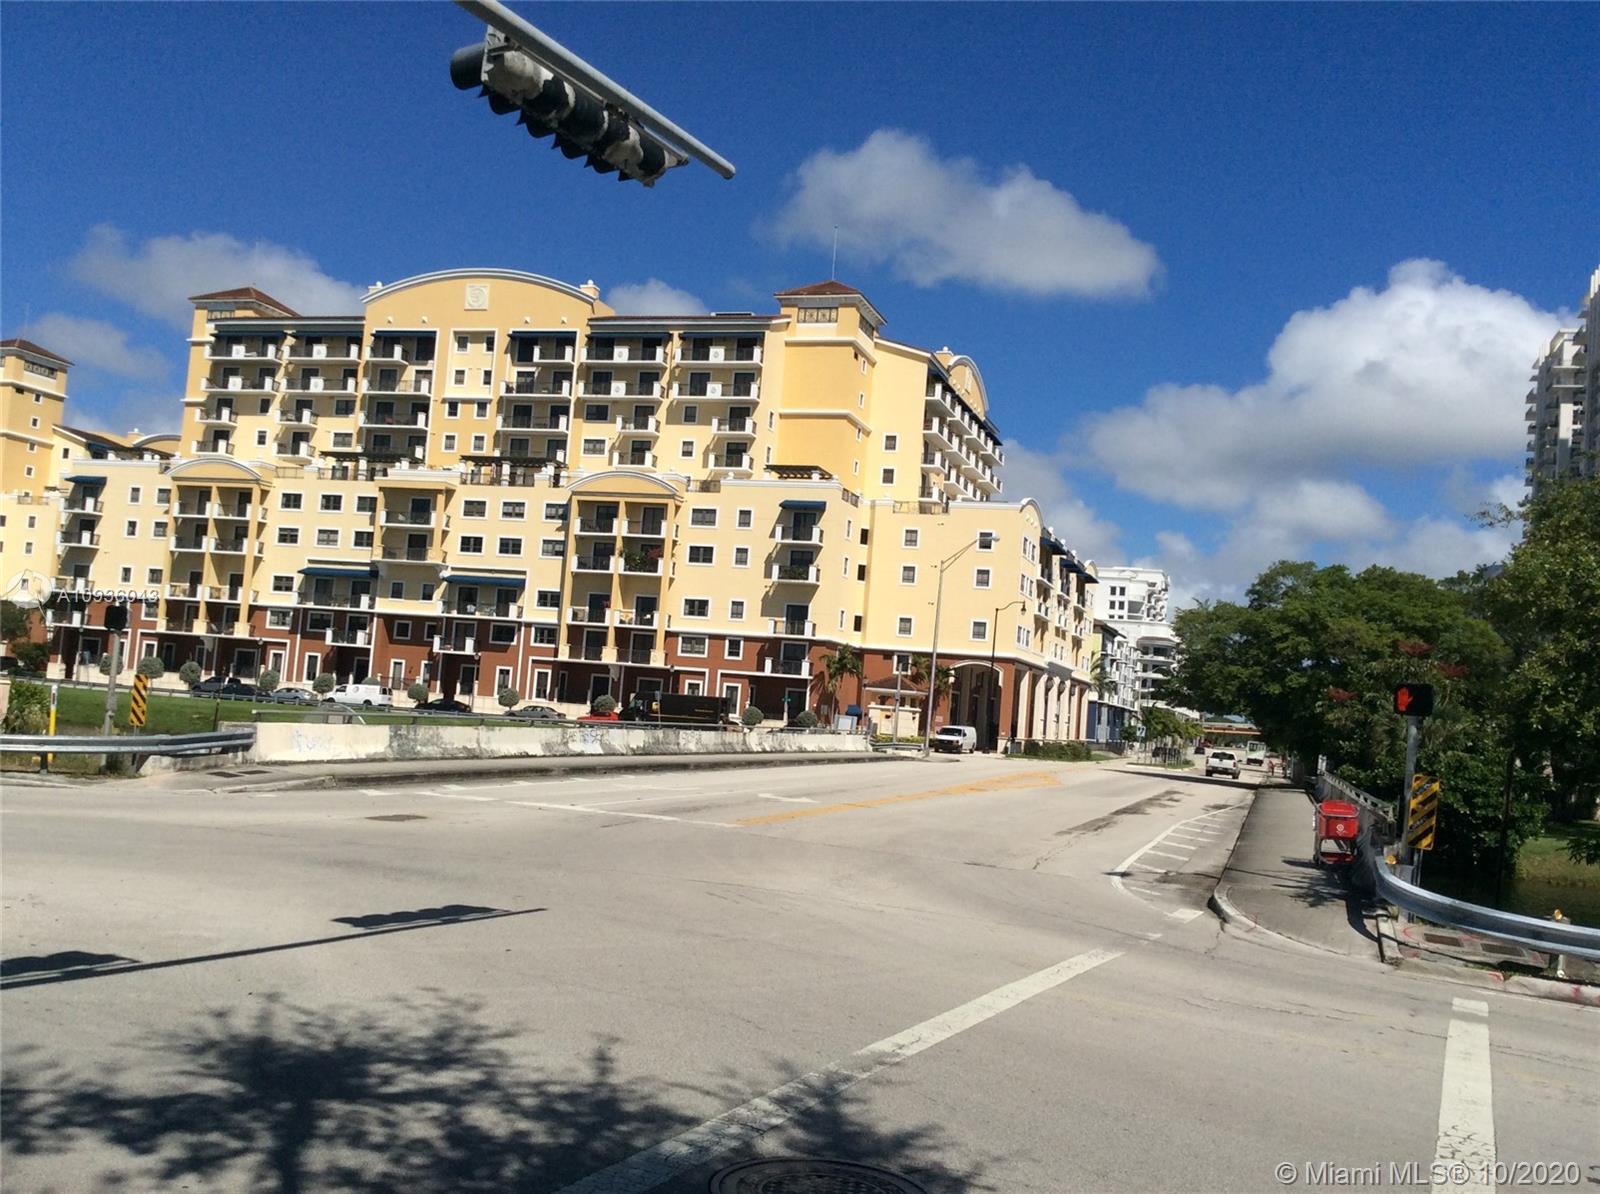 Colonnade At Dadeland SE Condo #904 - 8390 SW 72nd Ave #904, Miami, FL 33143